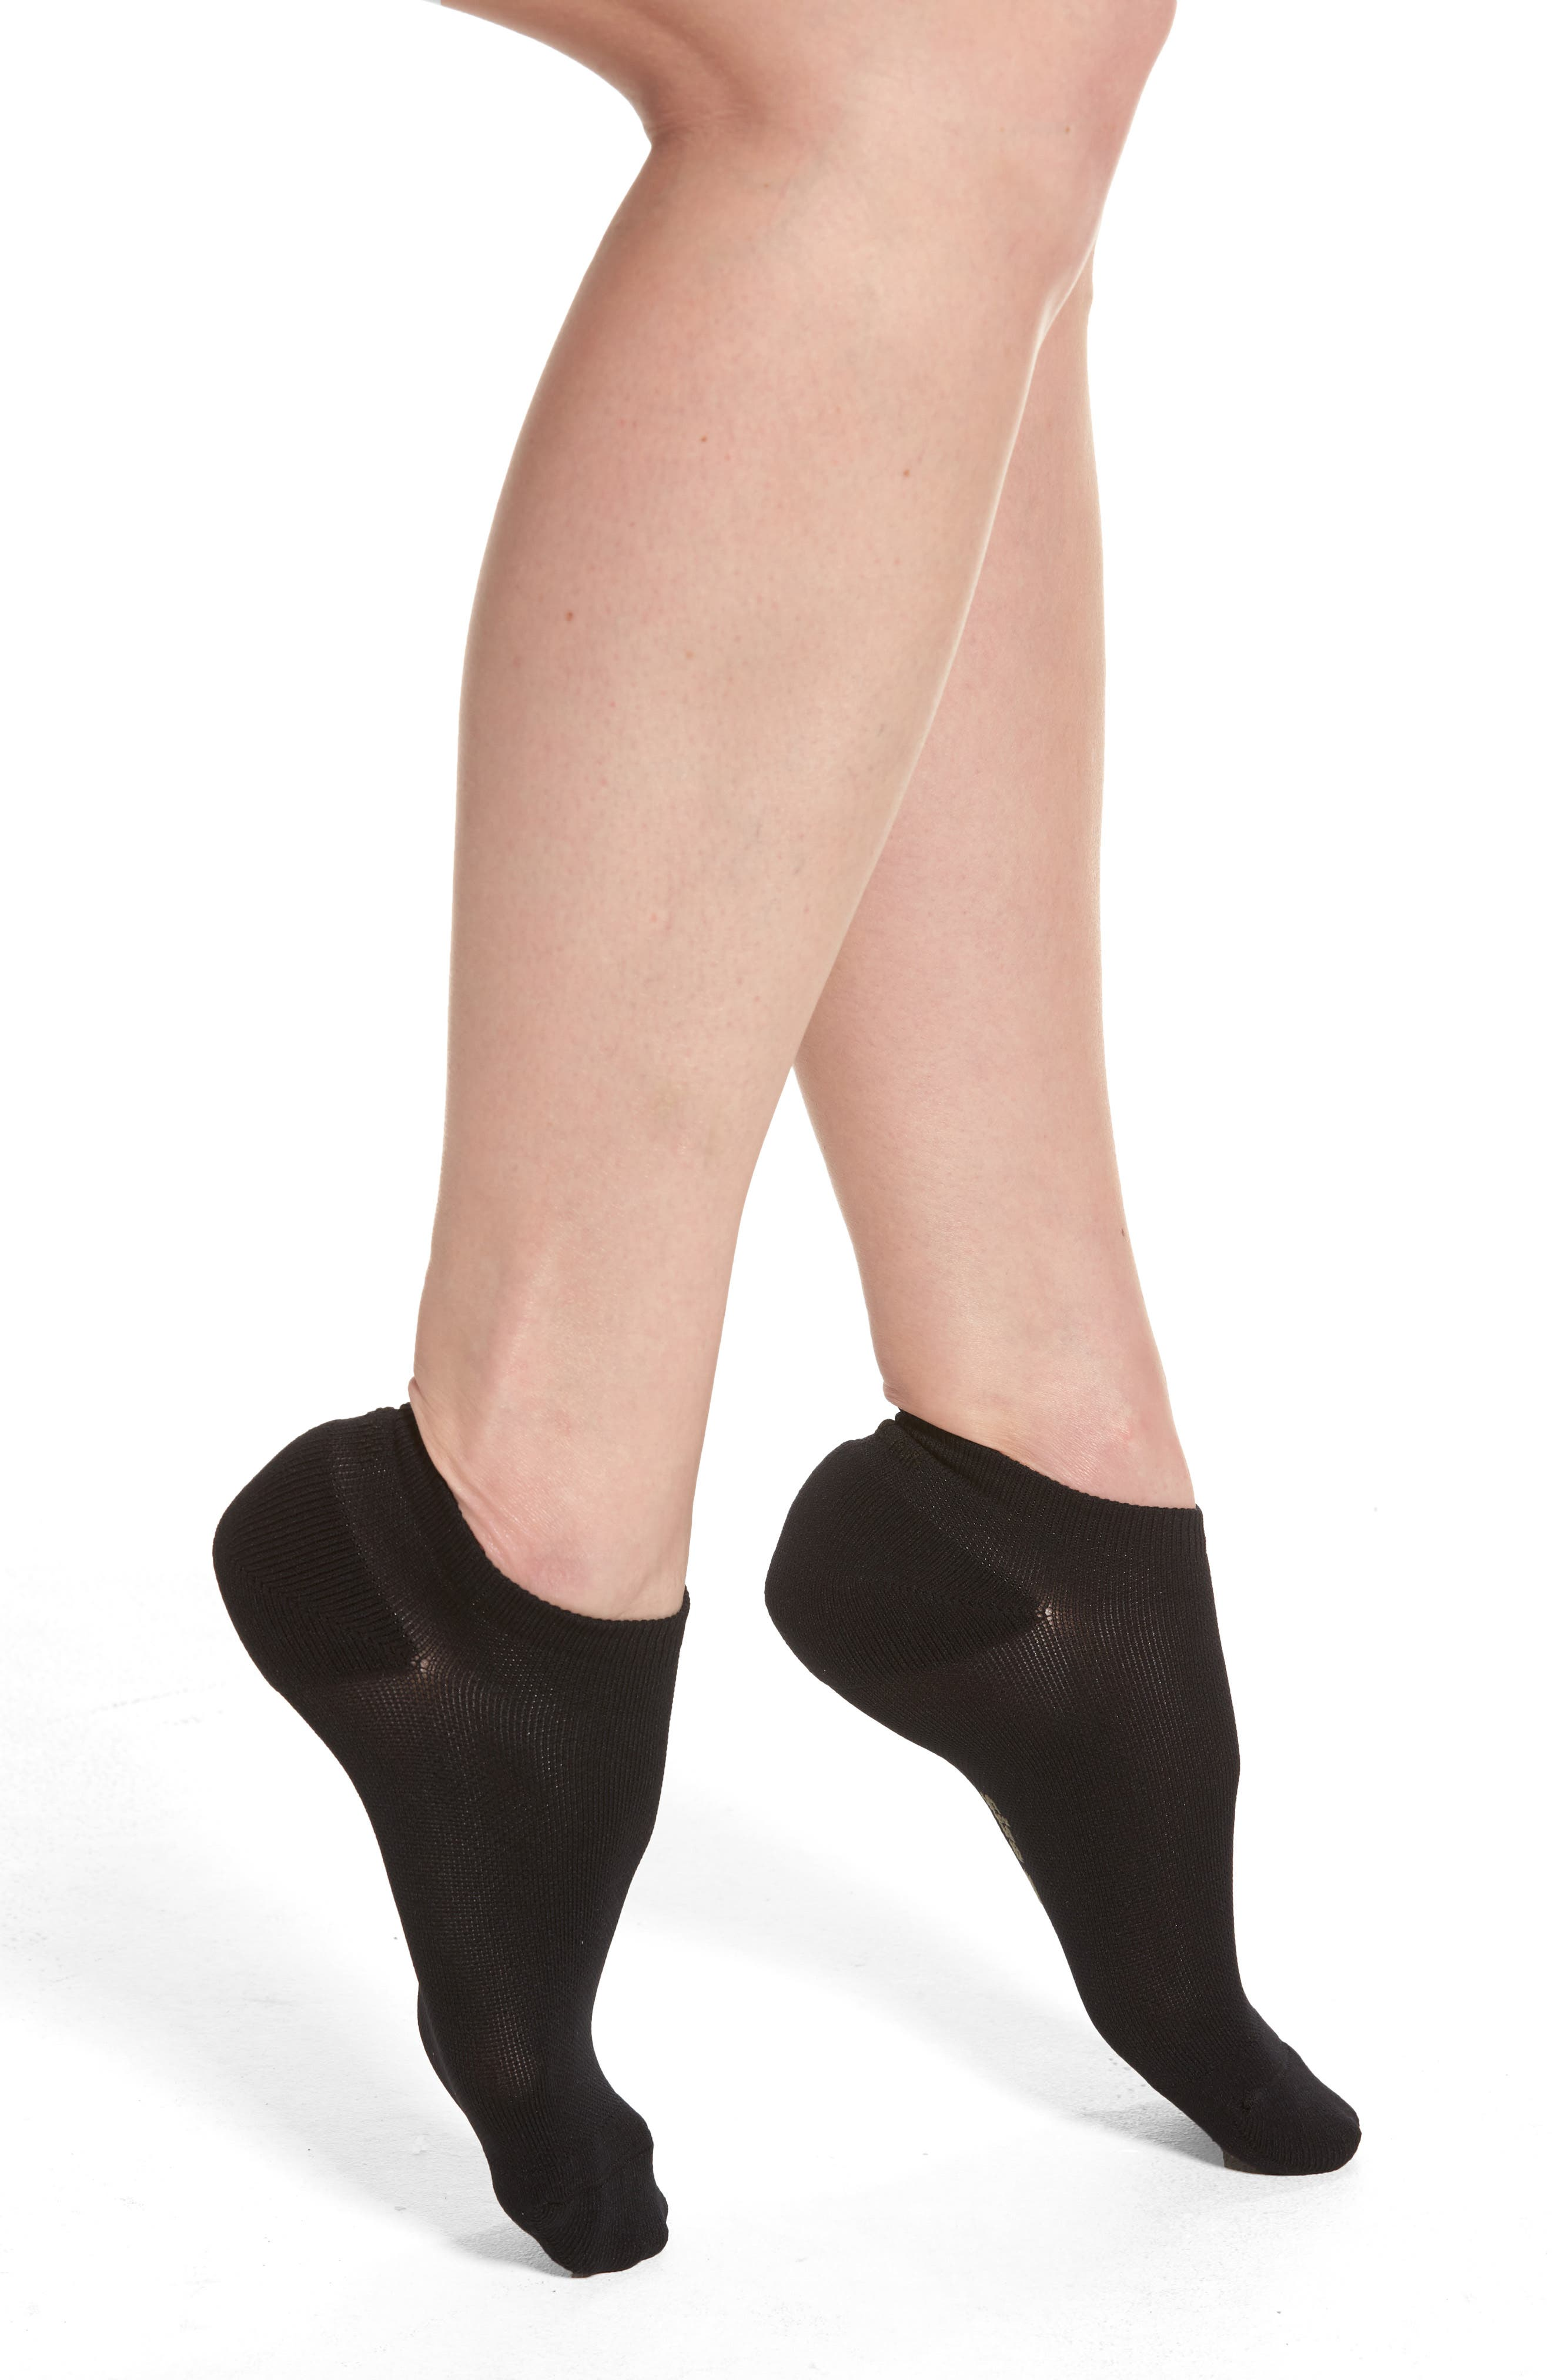 Low-Cut Socks,                             Main thumbnail 1, color,                             BLACK